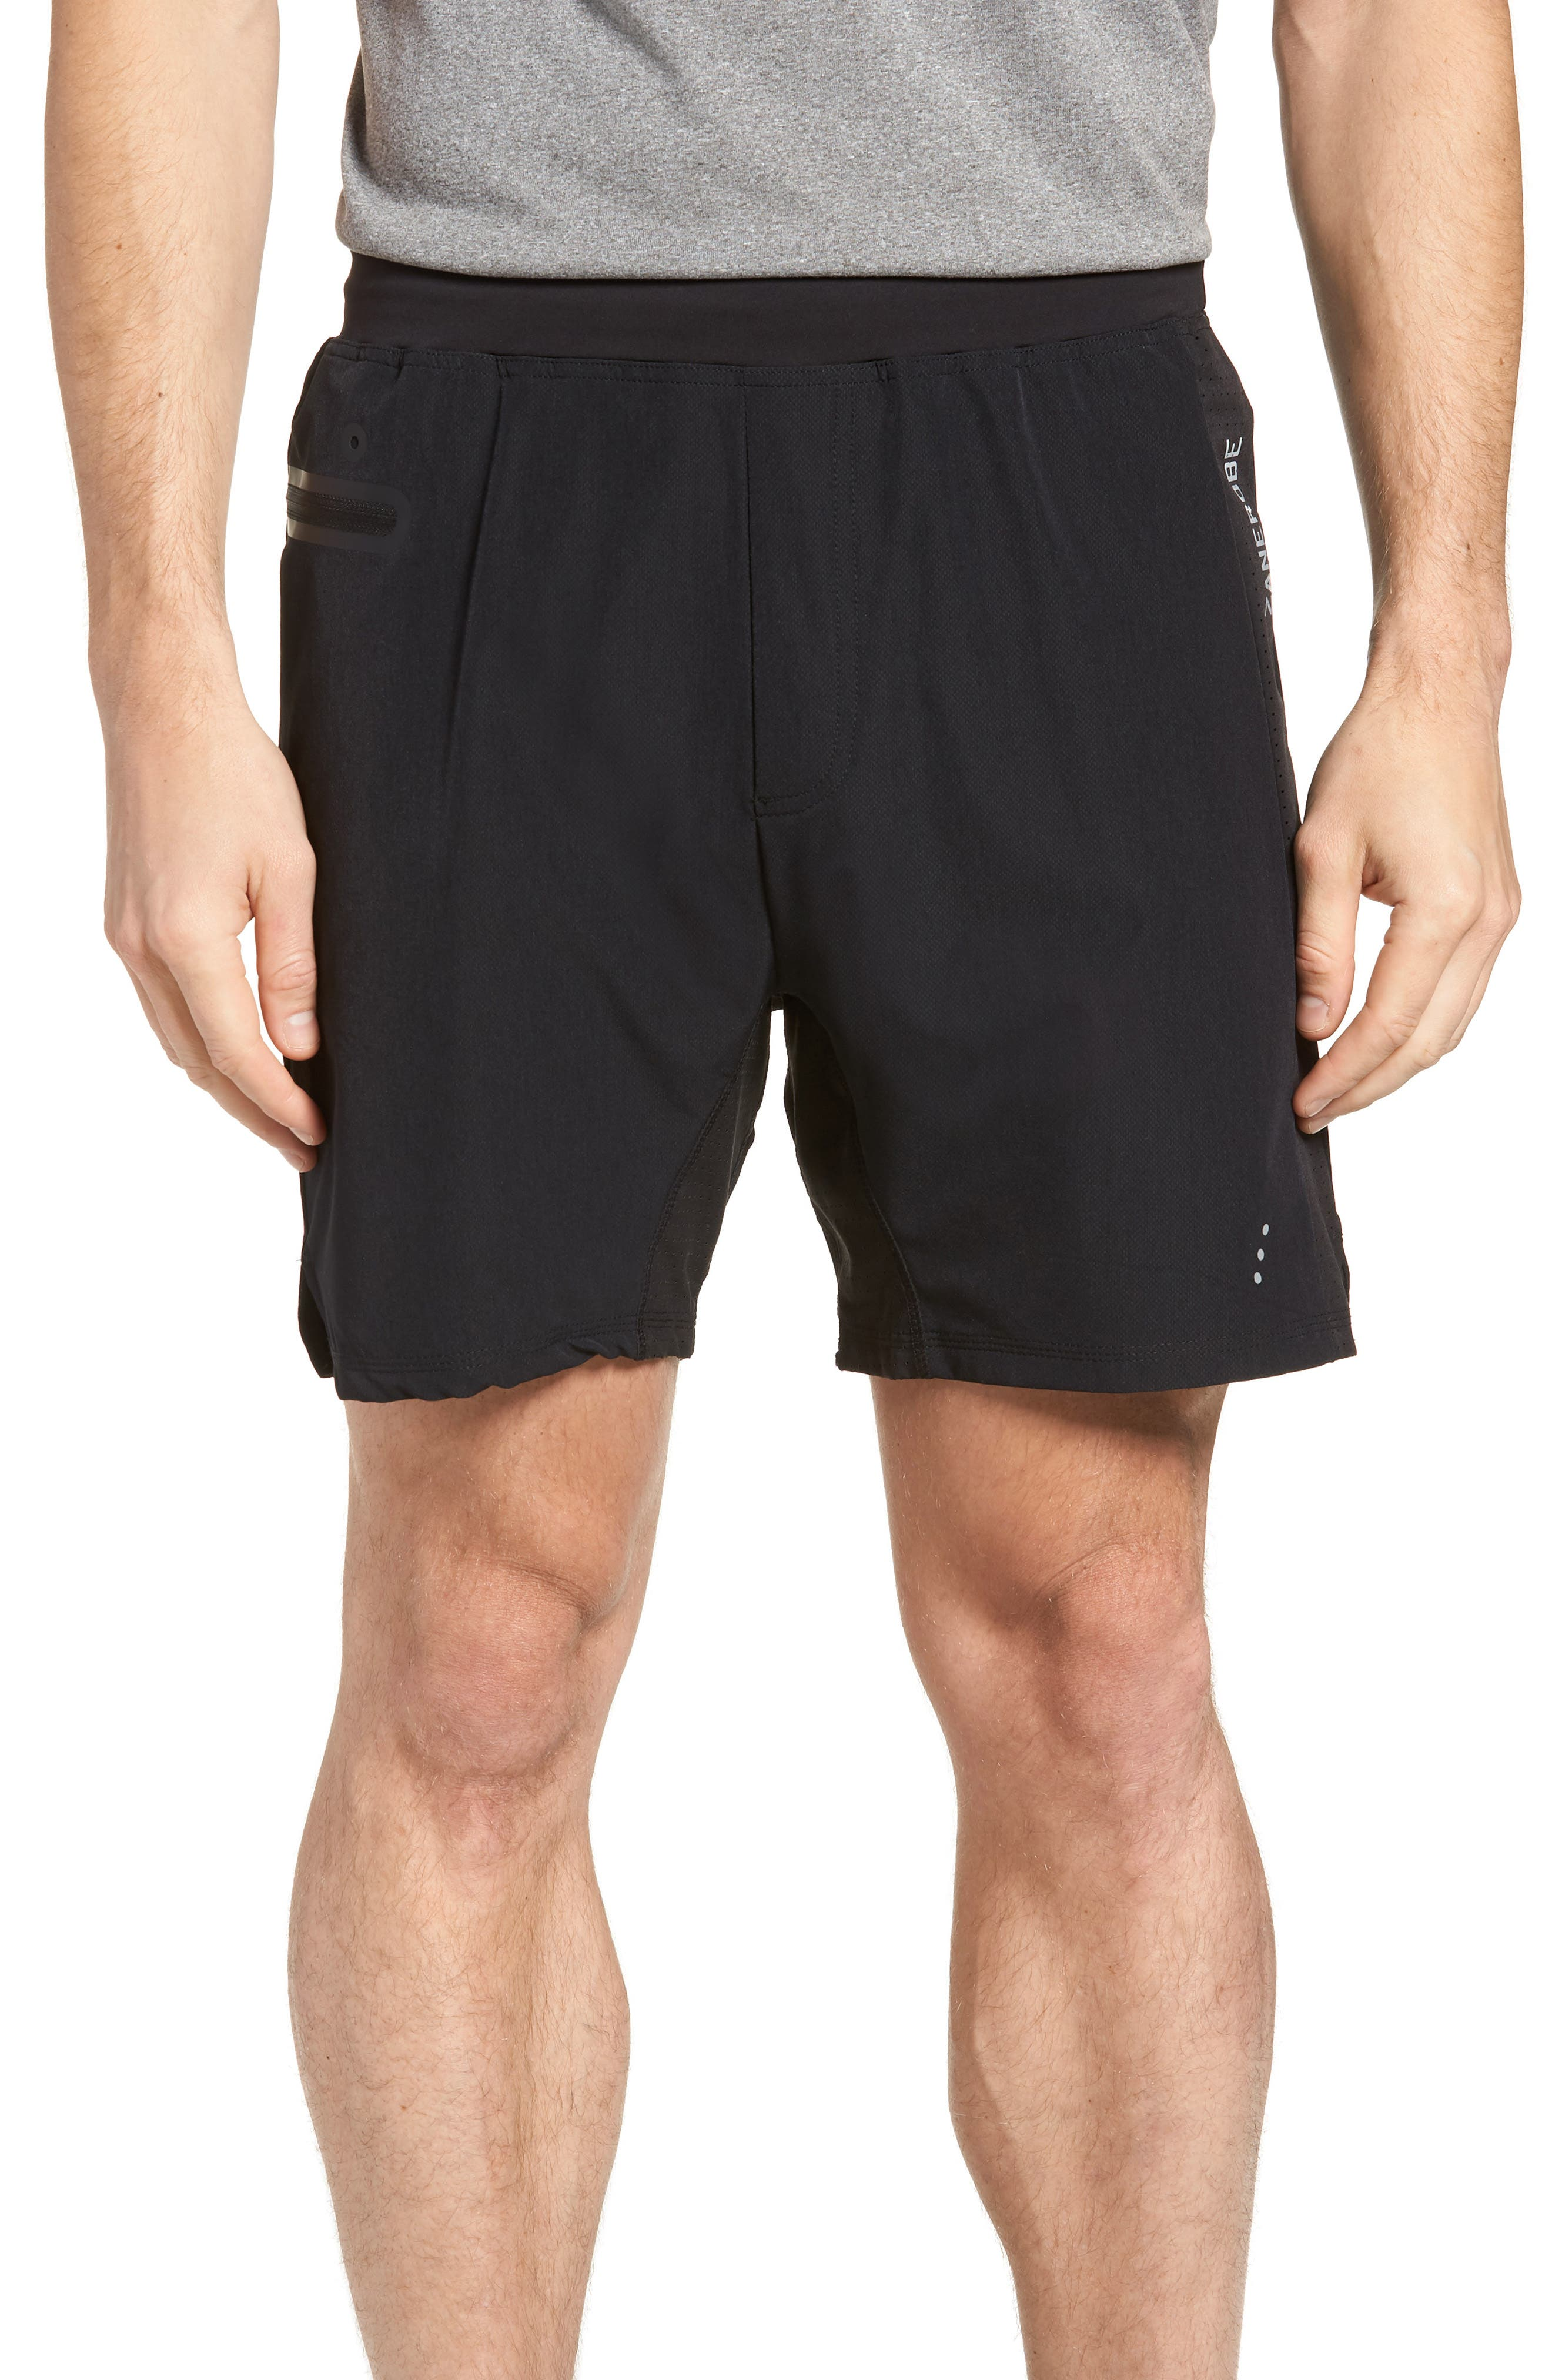 ZANEROBE Type 1 Shorts,                         Main,                         color, Black